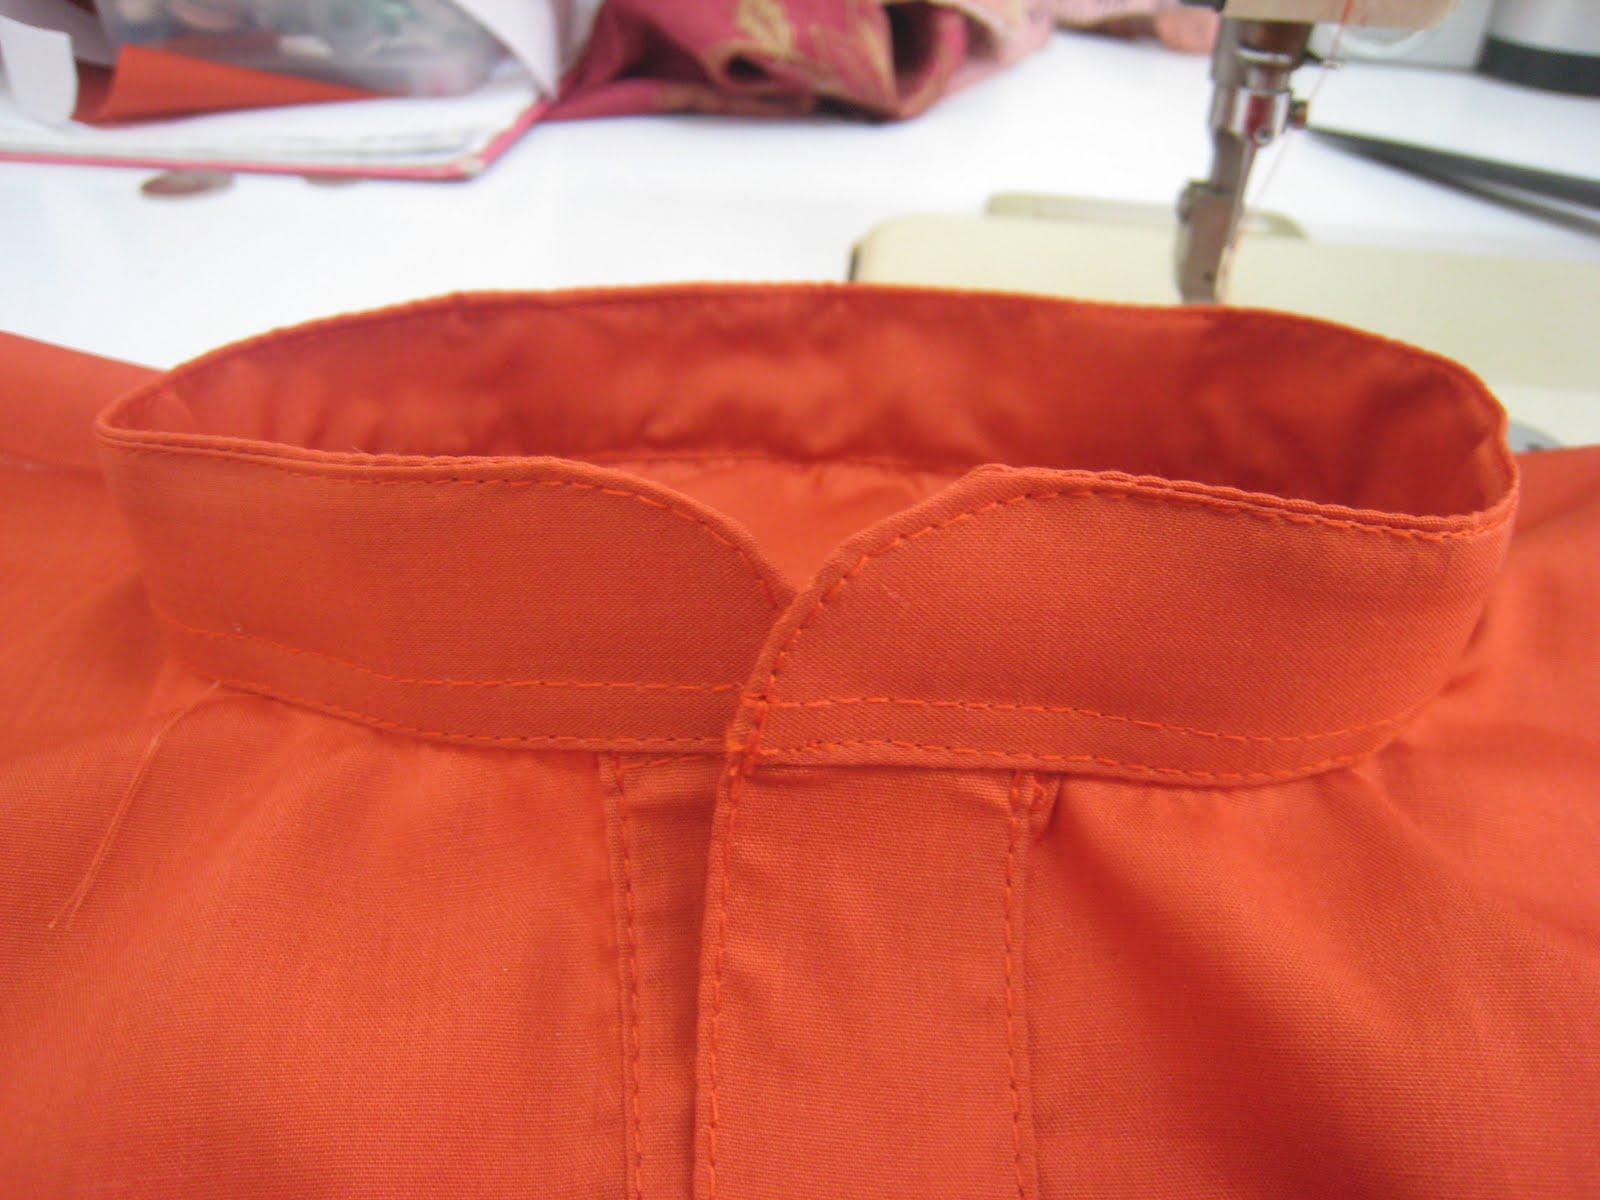 Untuk melihat video tutorial cara-cara menjahit leher baju melayu sila